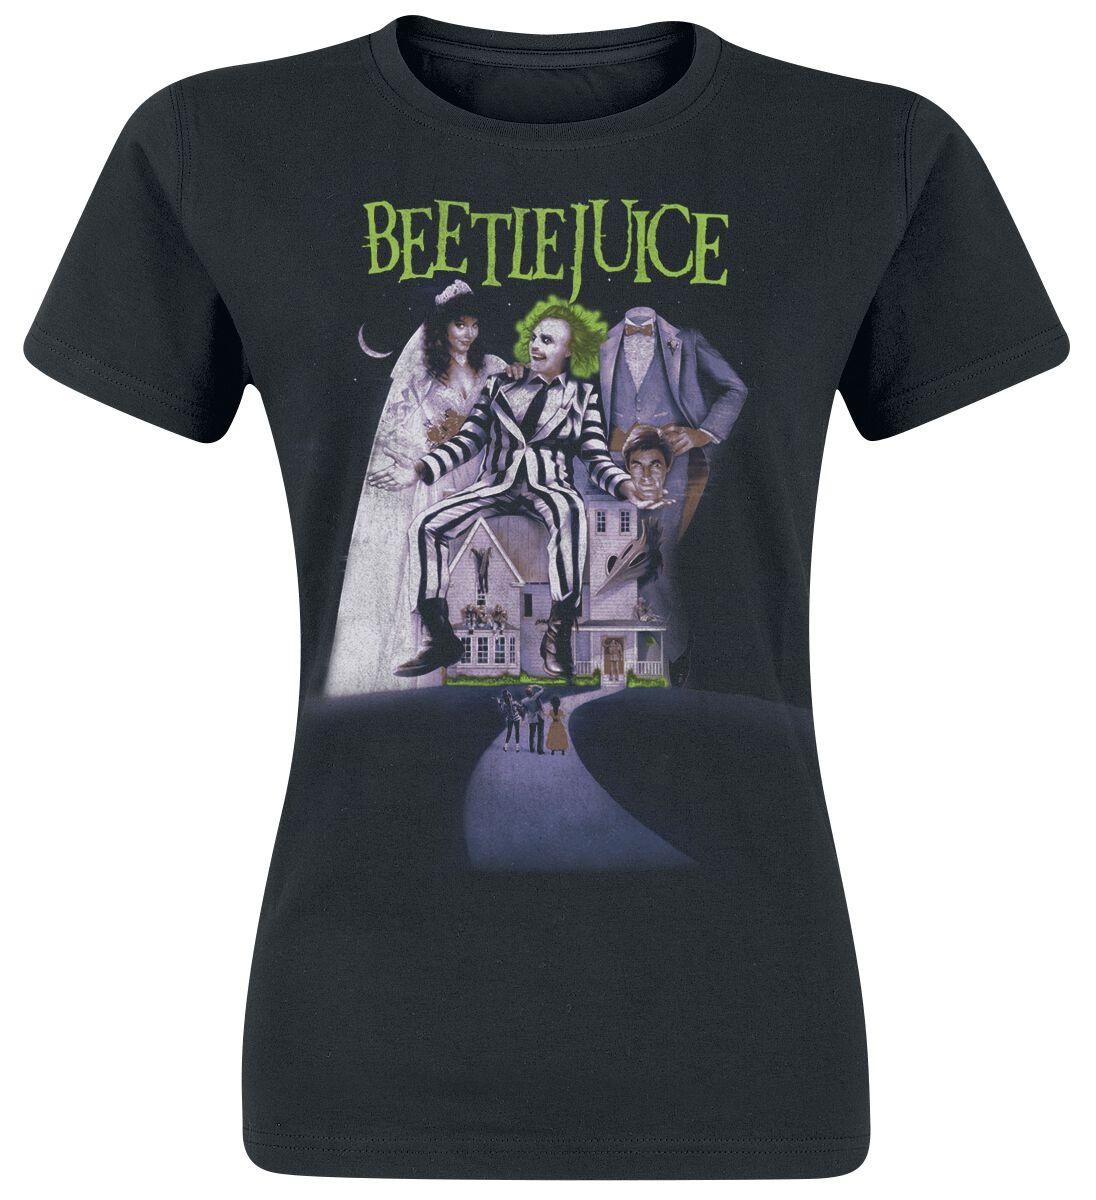 Merch dla Fanów - Koszulki - Koszulka damska Beetlejuice Poster Koszulka damska czarny - 372758